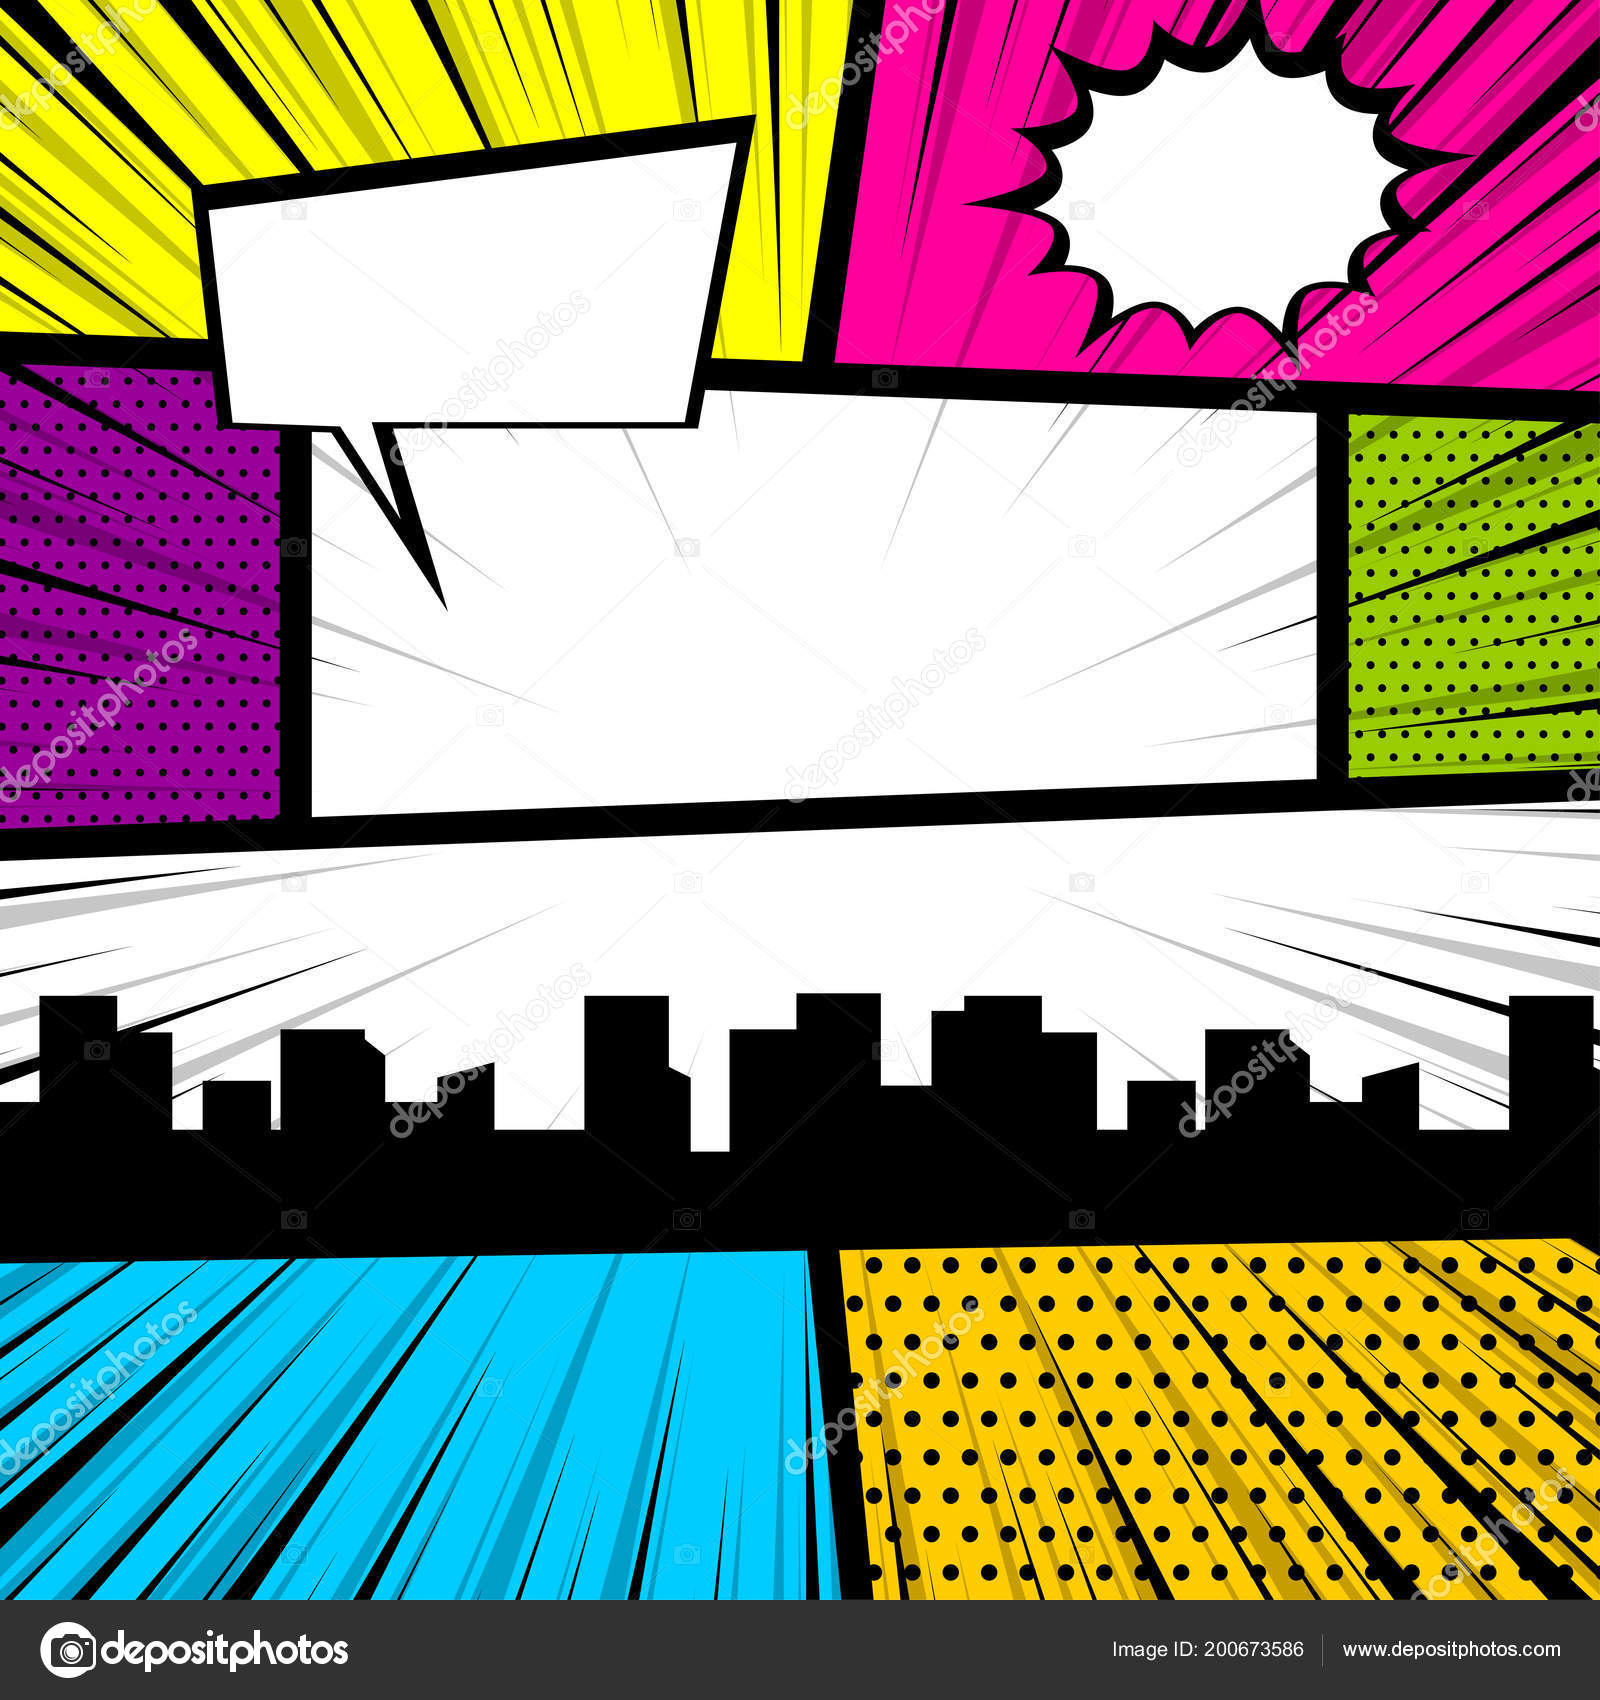 Comic book backdrop | Pop art comic book colored backdrop